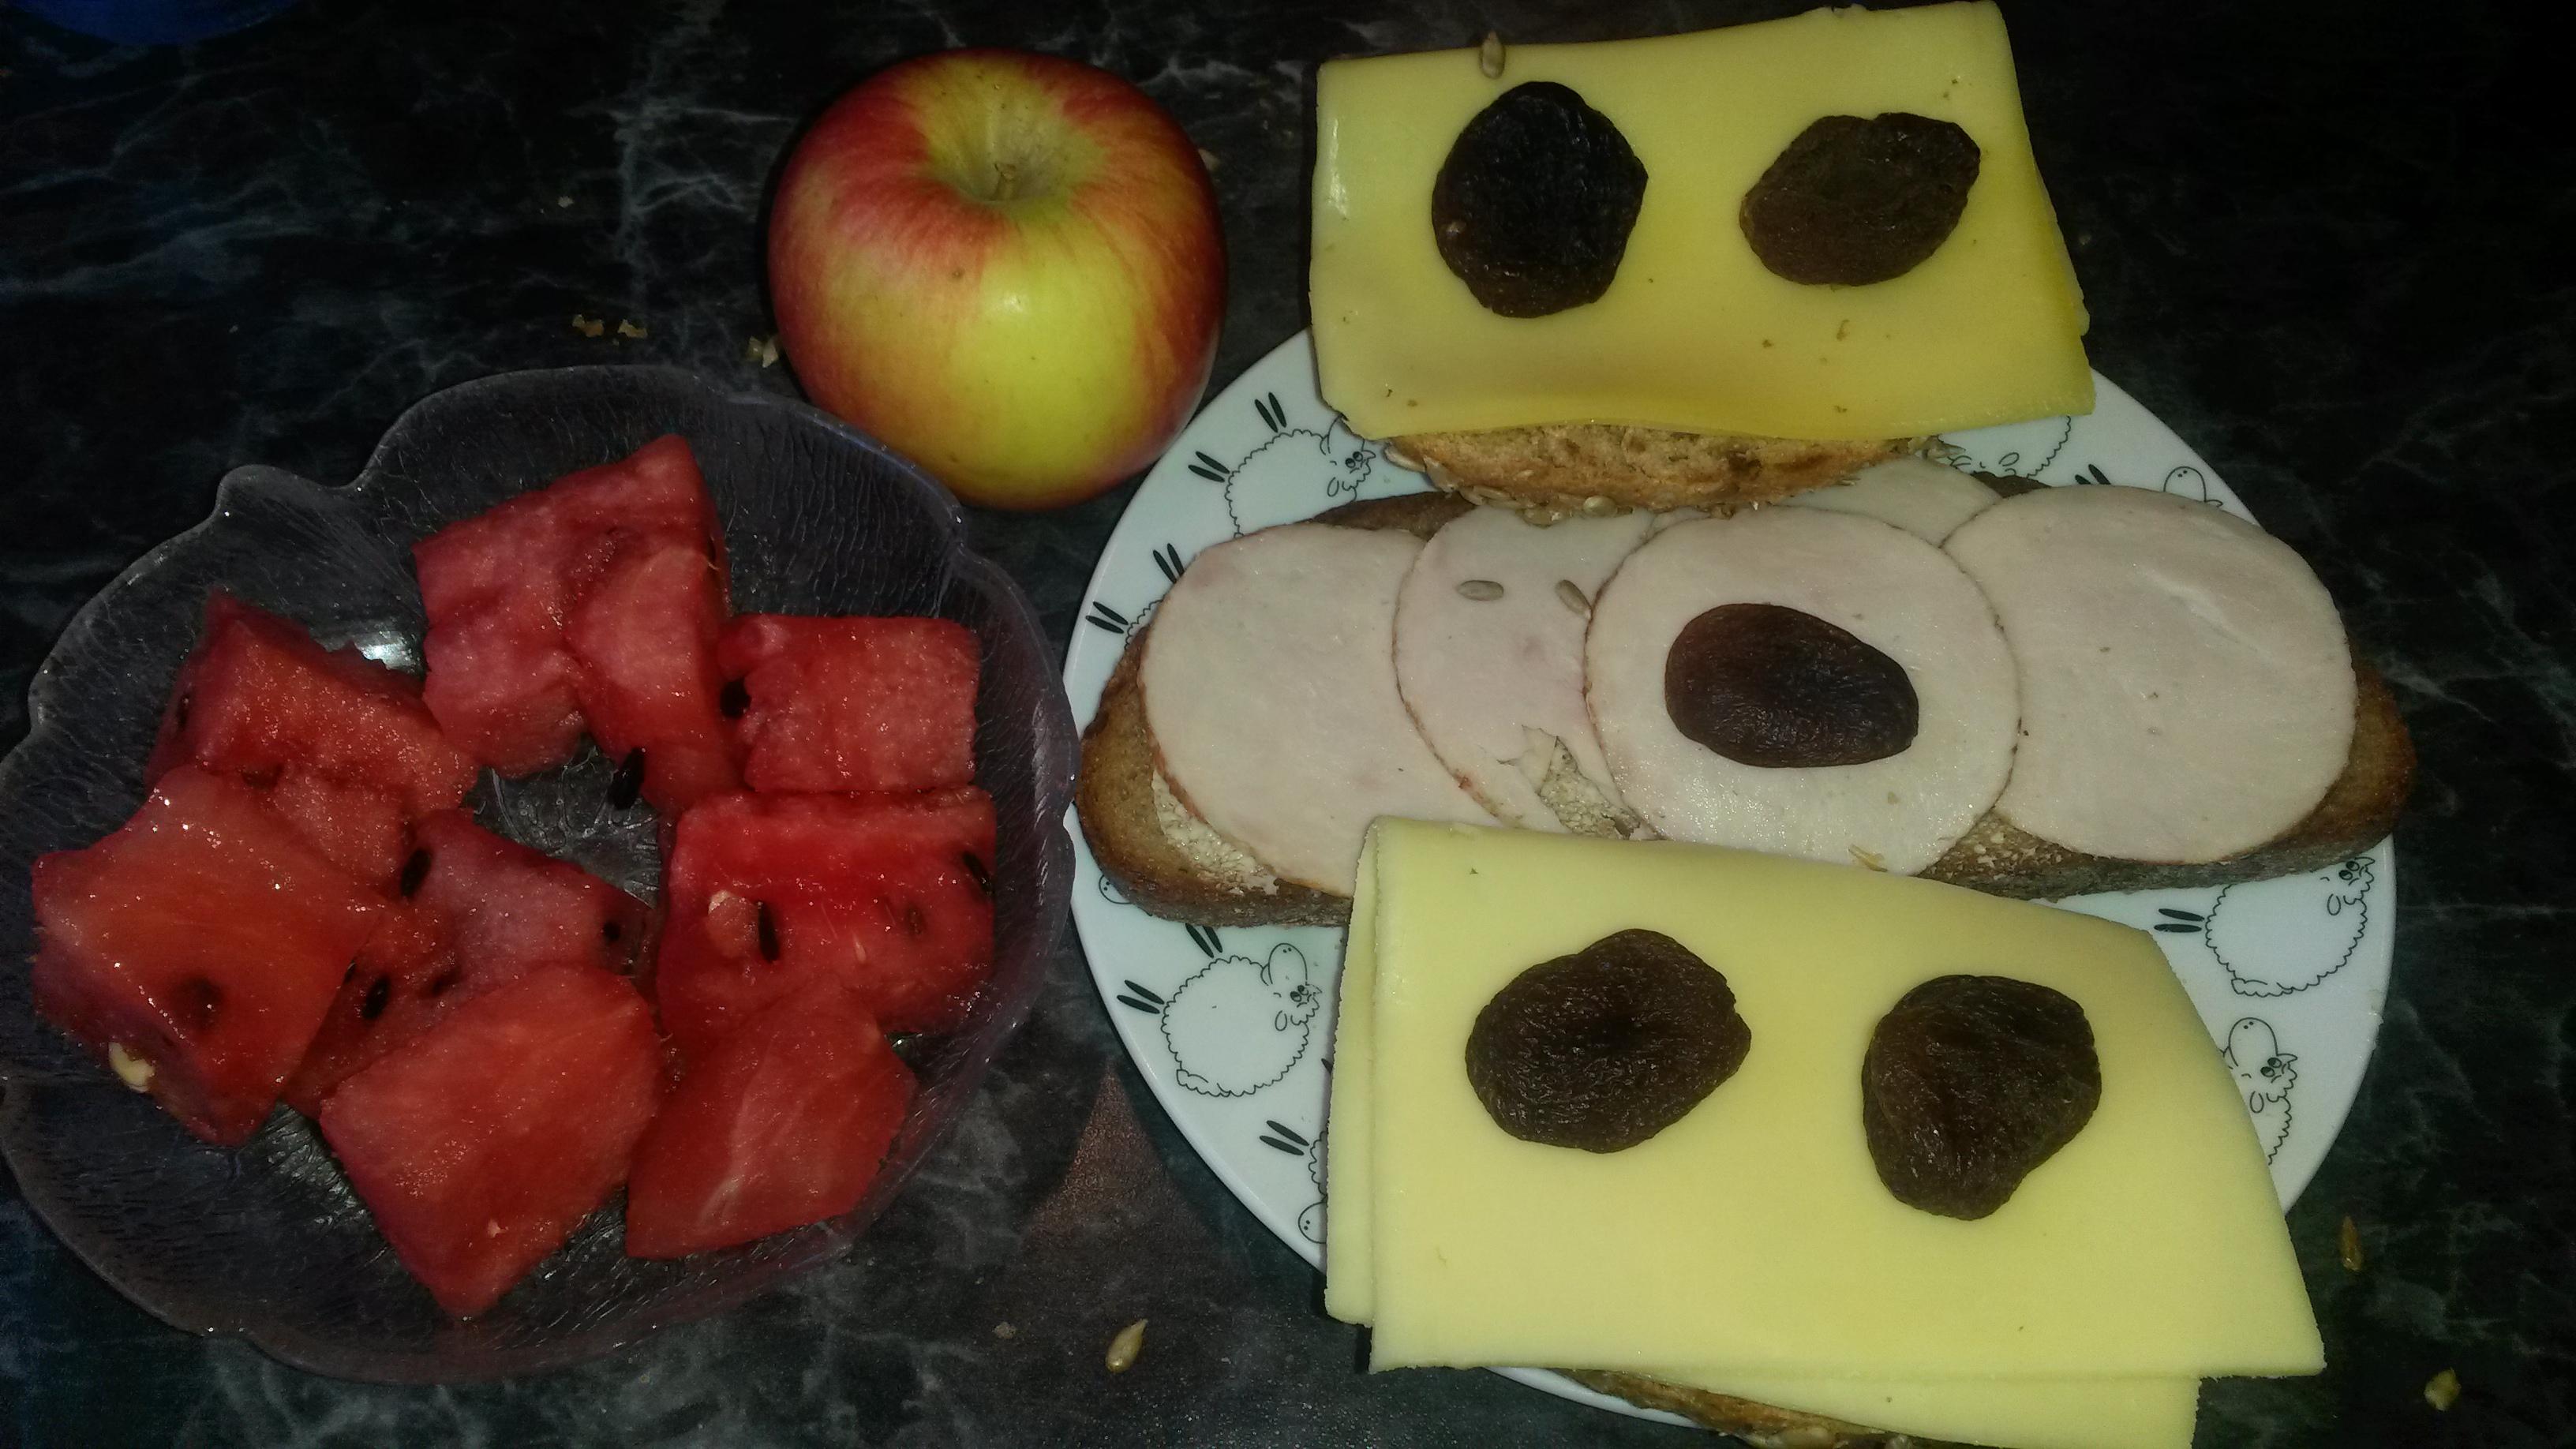 https://foodloader.net/sk0r_2014-06-08_Kaesebroetchen_Wurstbrot_Apfel_Wassermelone_Trockenobst.jpg